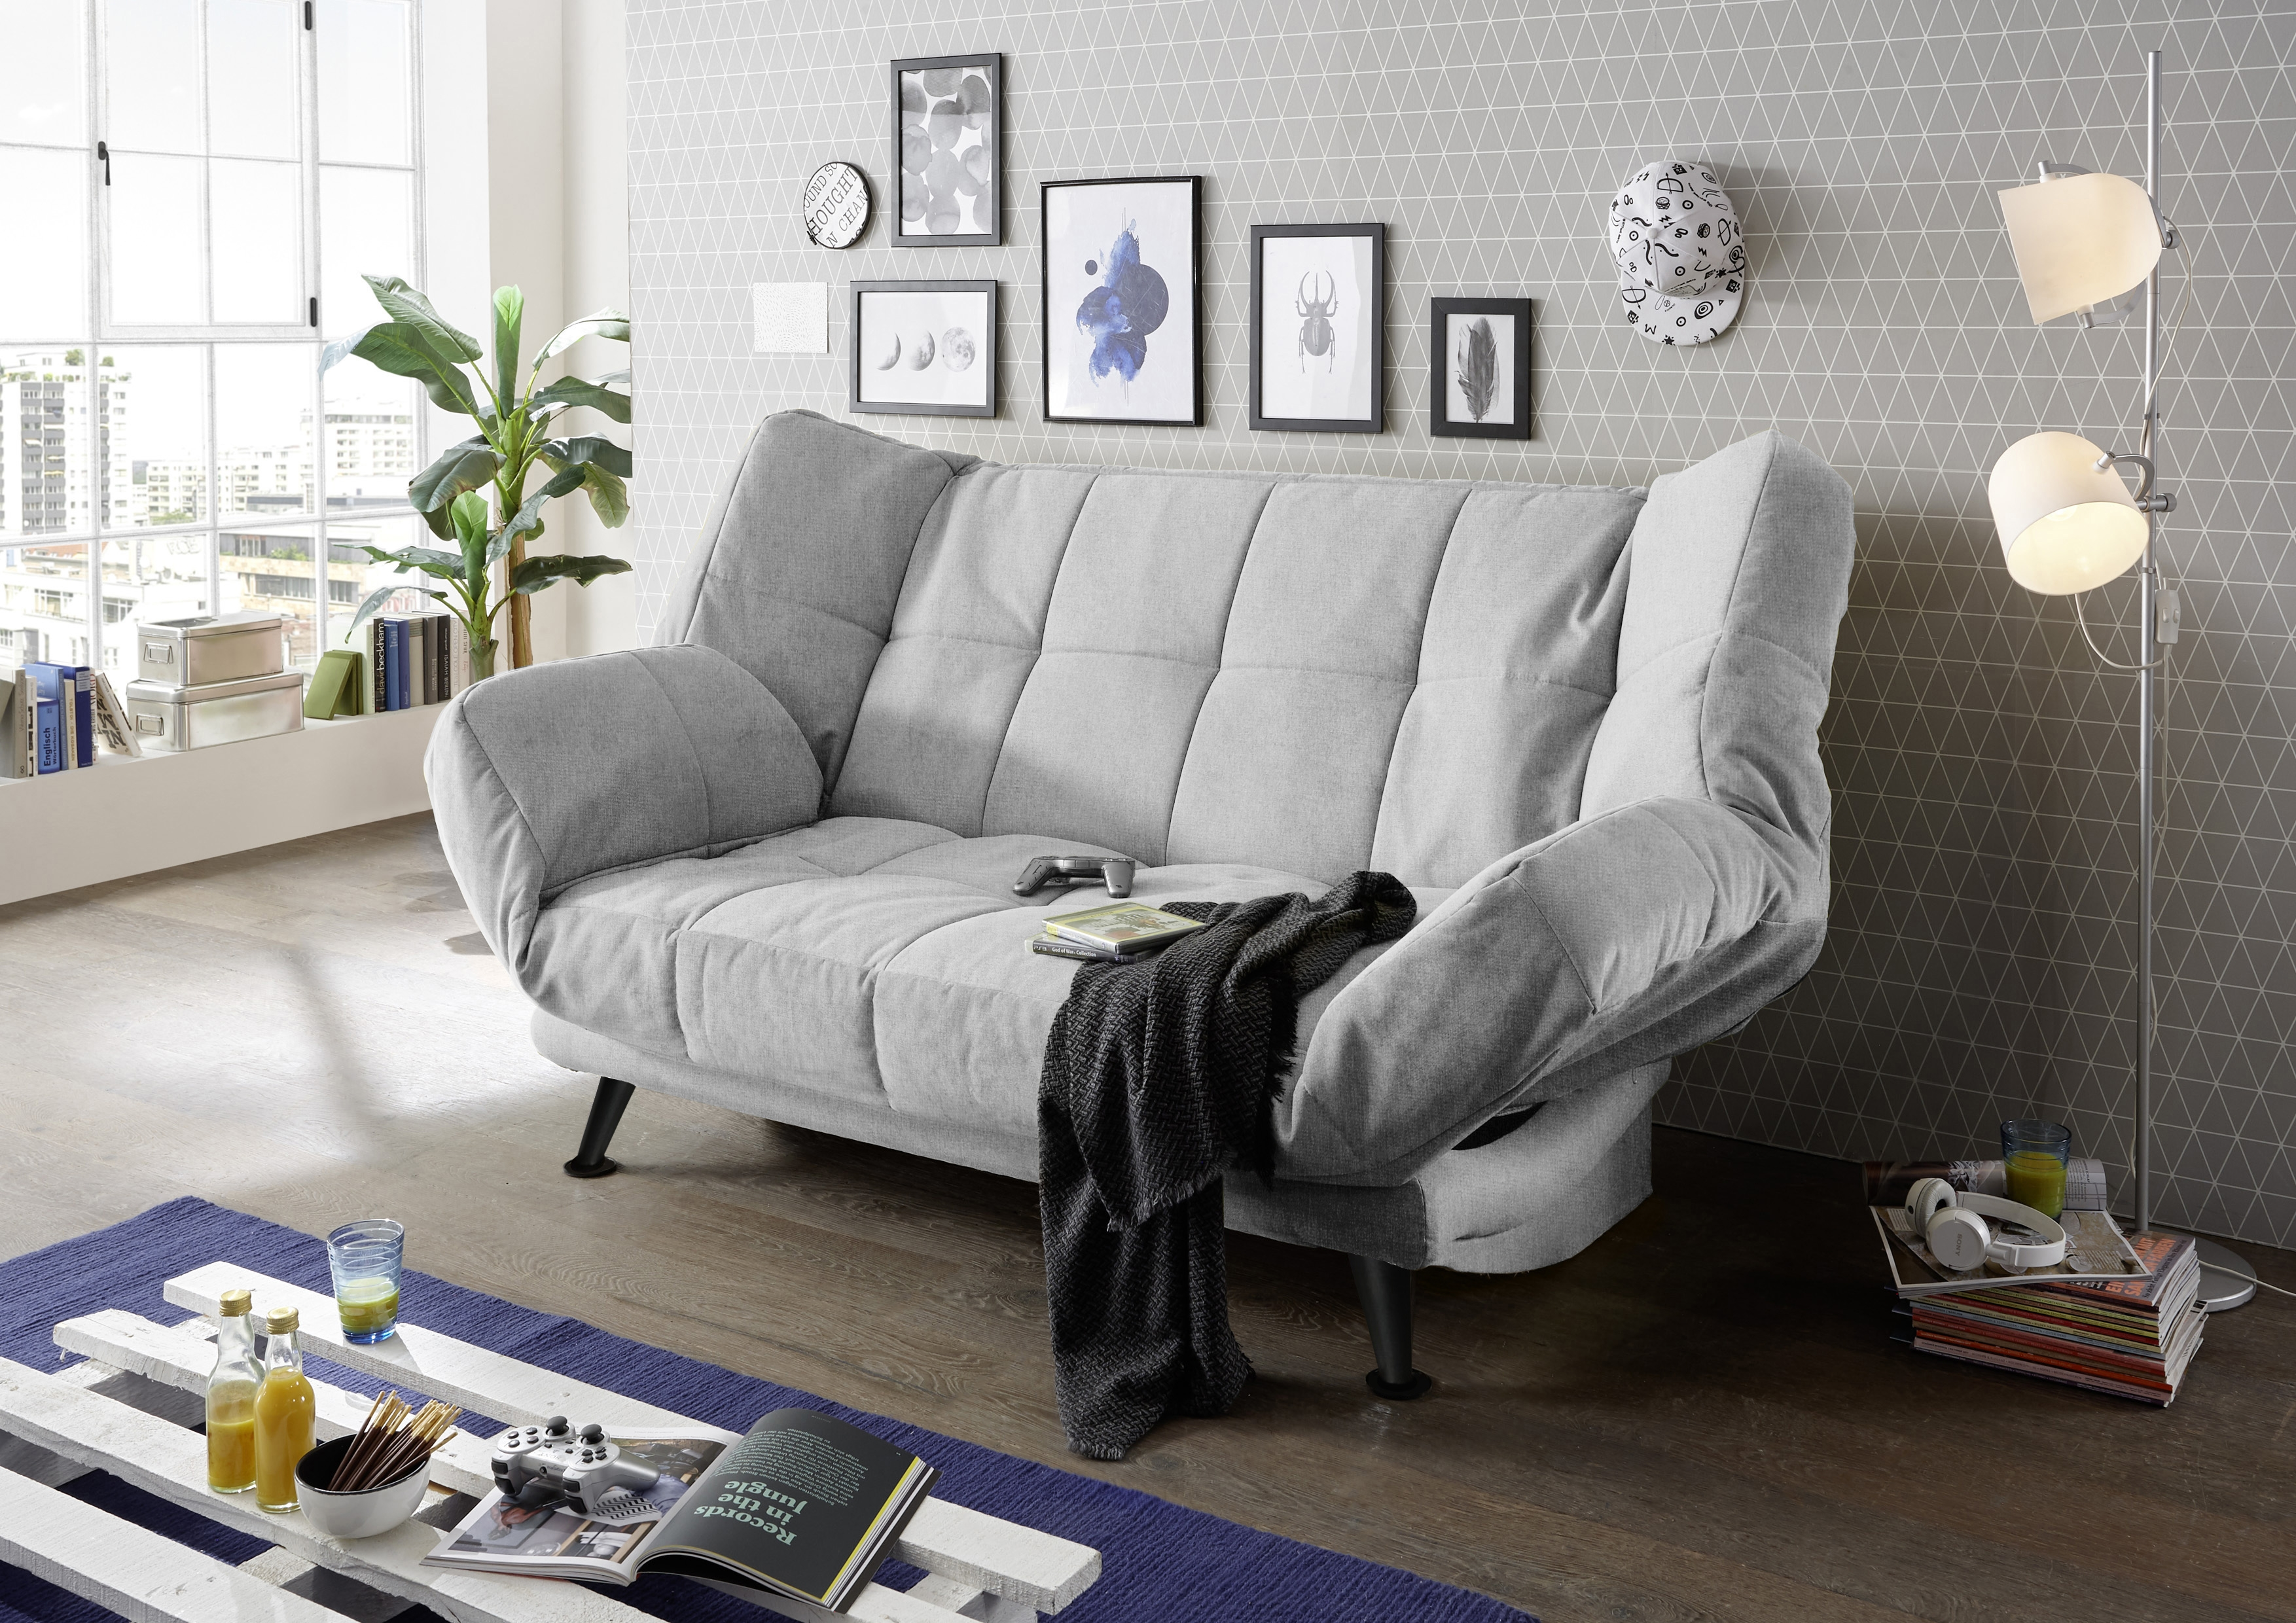 Canapea extensibila cu lada de depozitare, tapitata cu stofa, 3 locuri Ikaris 2 Gri, l208xA98xH102 cm poza